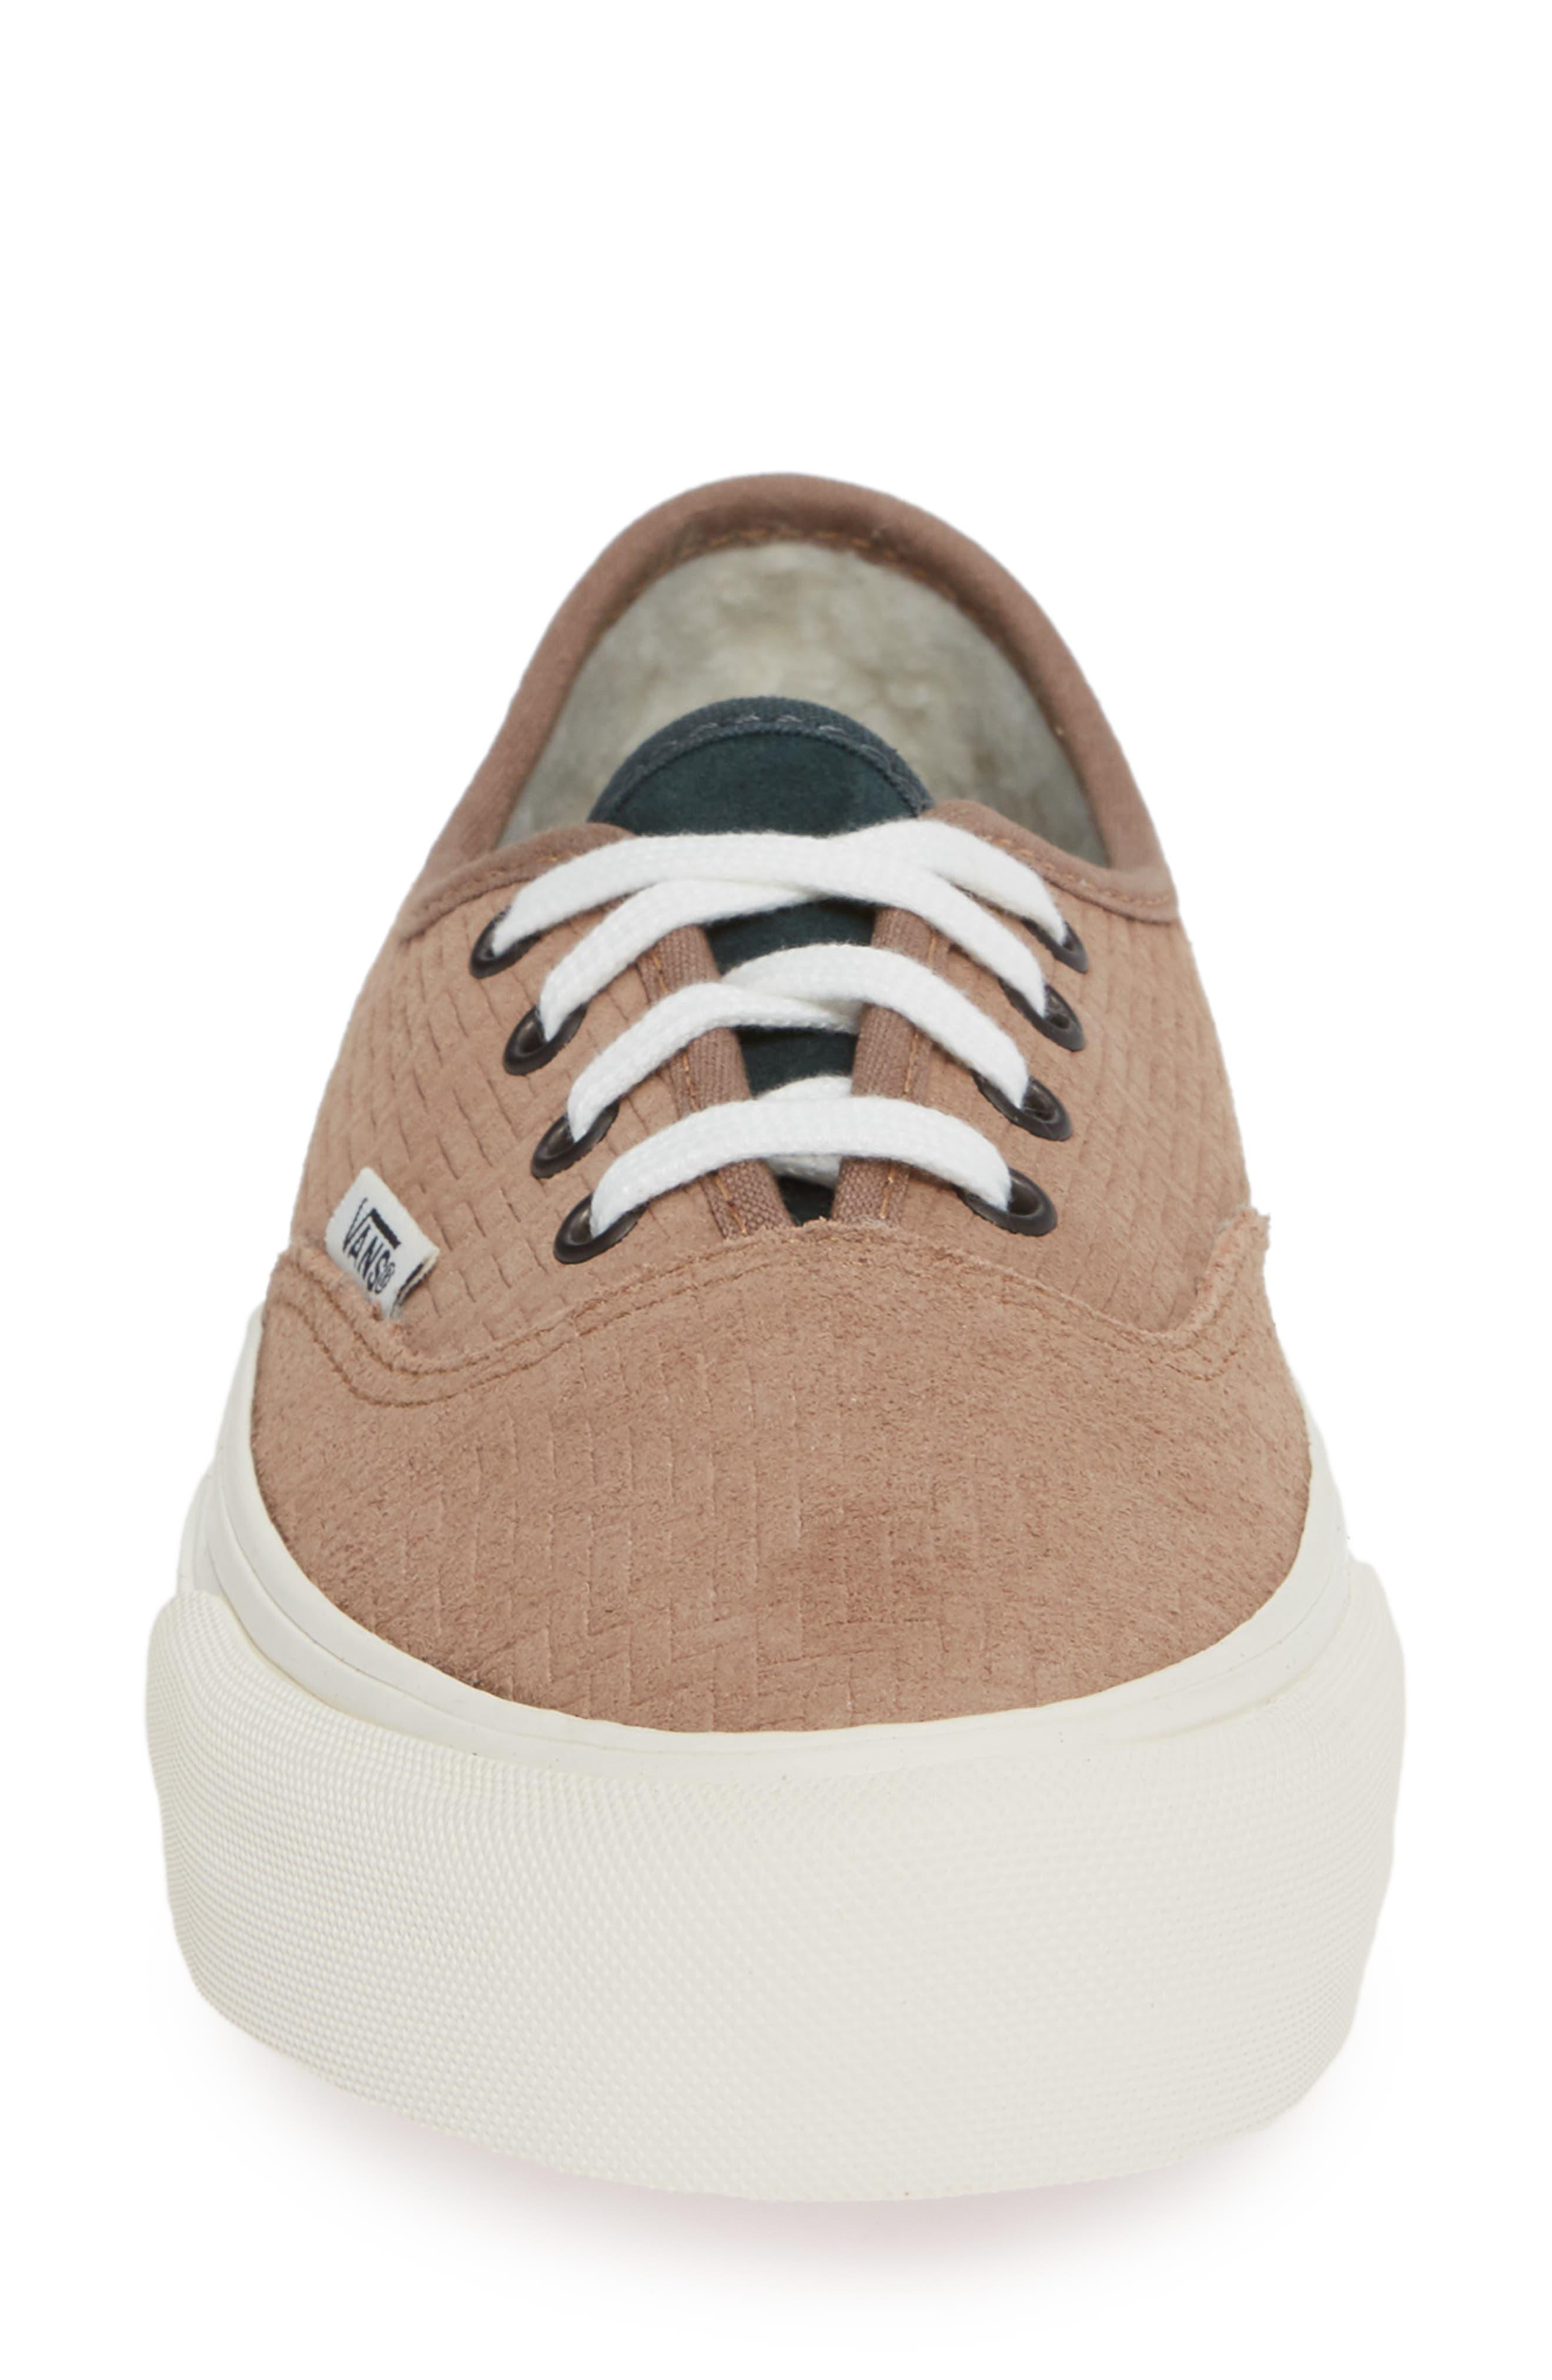 UA Authentic SF Collapsible Heel Sneaker,                             Alternate thumbnail 4, color,                             WOODSMOKE/ DARKEST SPRUCE